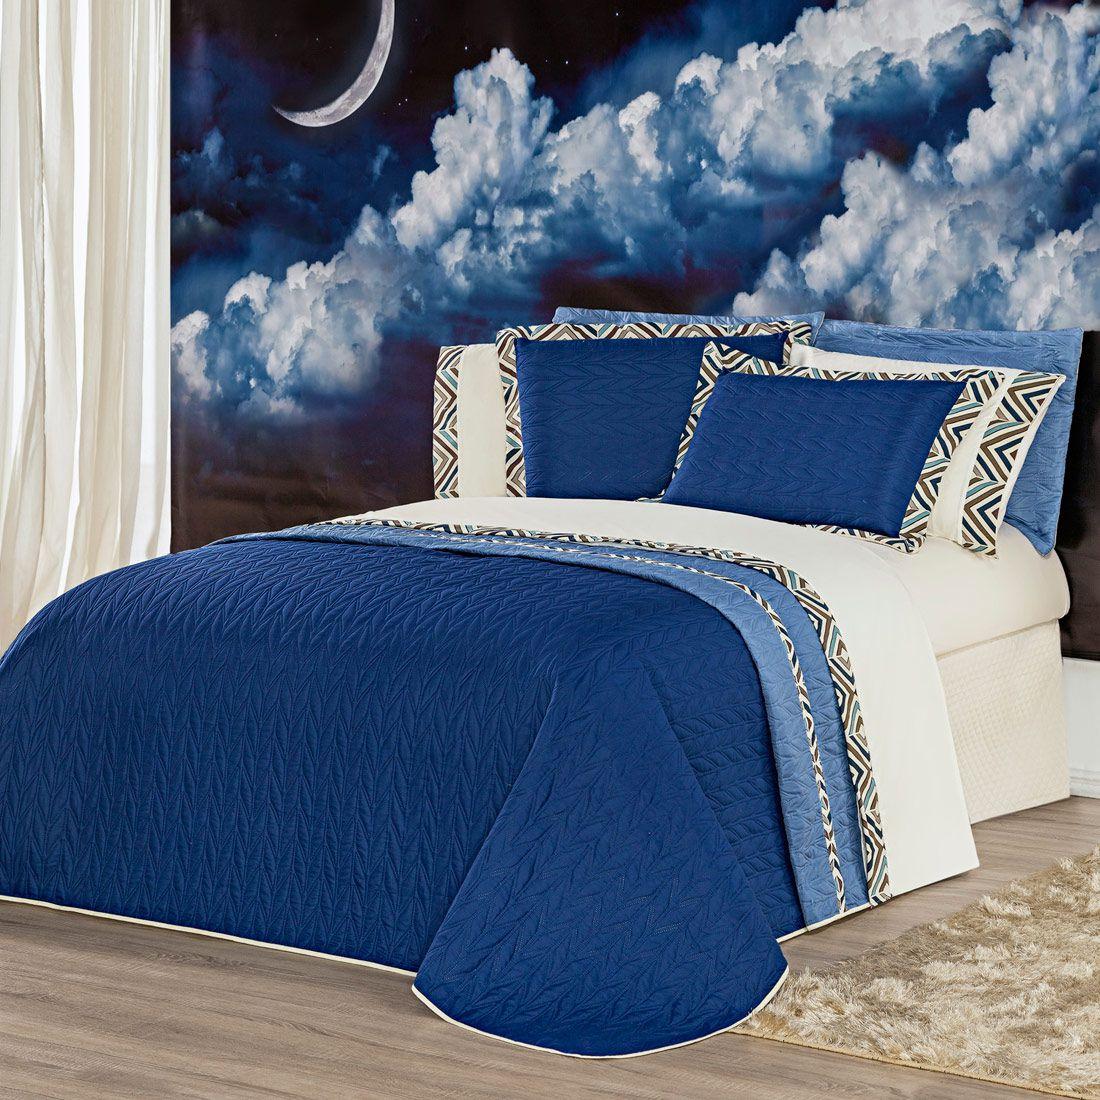 Kit Cobre Leito c/ Travesseiros Monte Carlo Azul King 07 Peças - Dupla Face